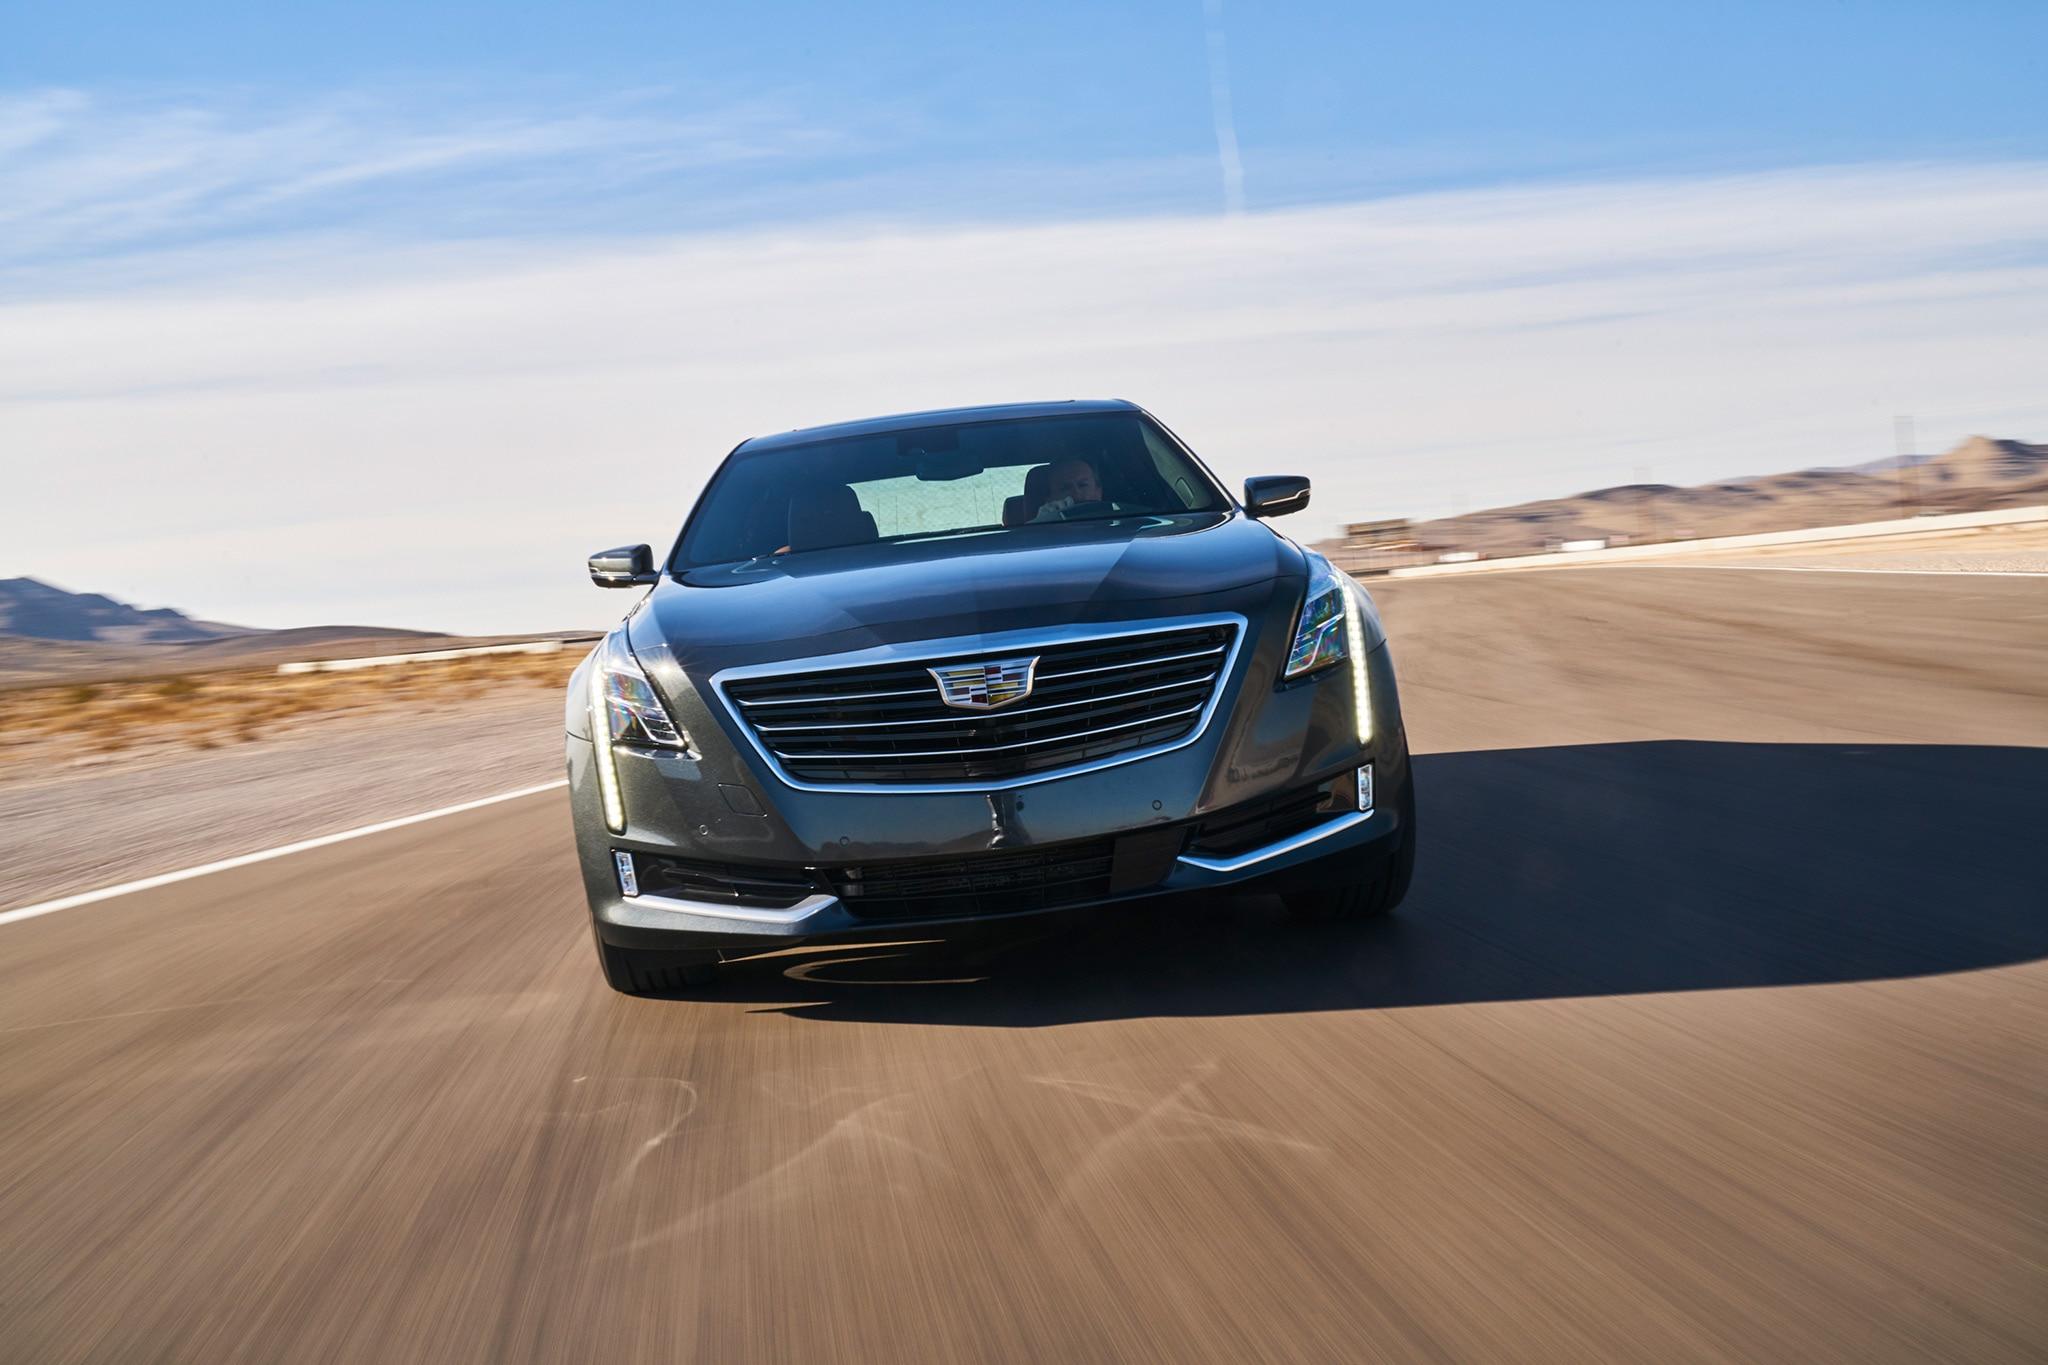 2017 Cadillac Ct6 2.0 L Turbo Luxury >> 2017 All-Stars Contender: Cadillac CT6 | Automobile Magazine